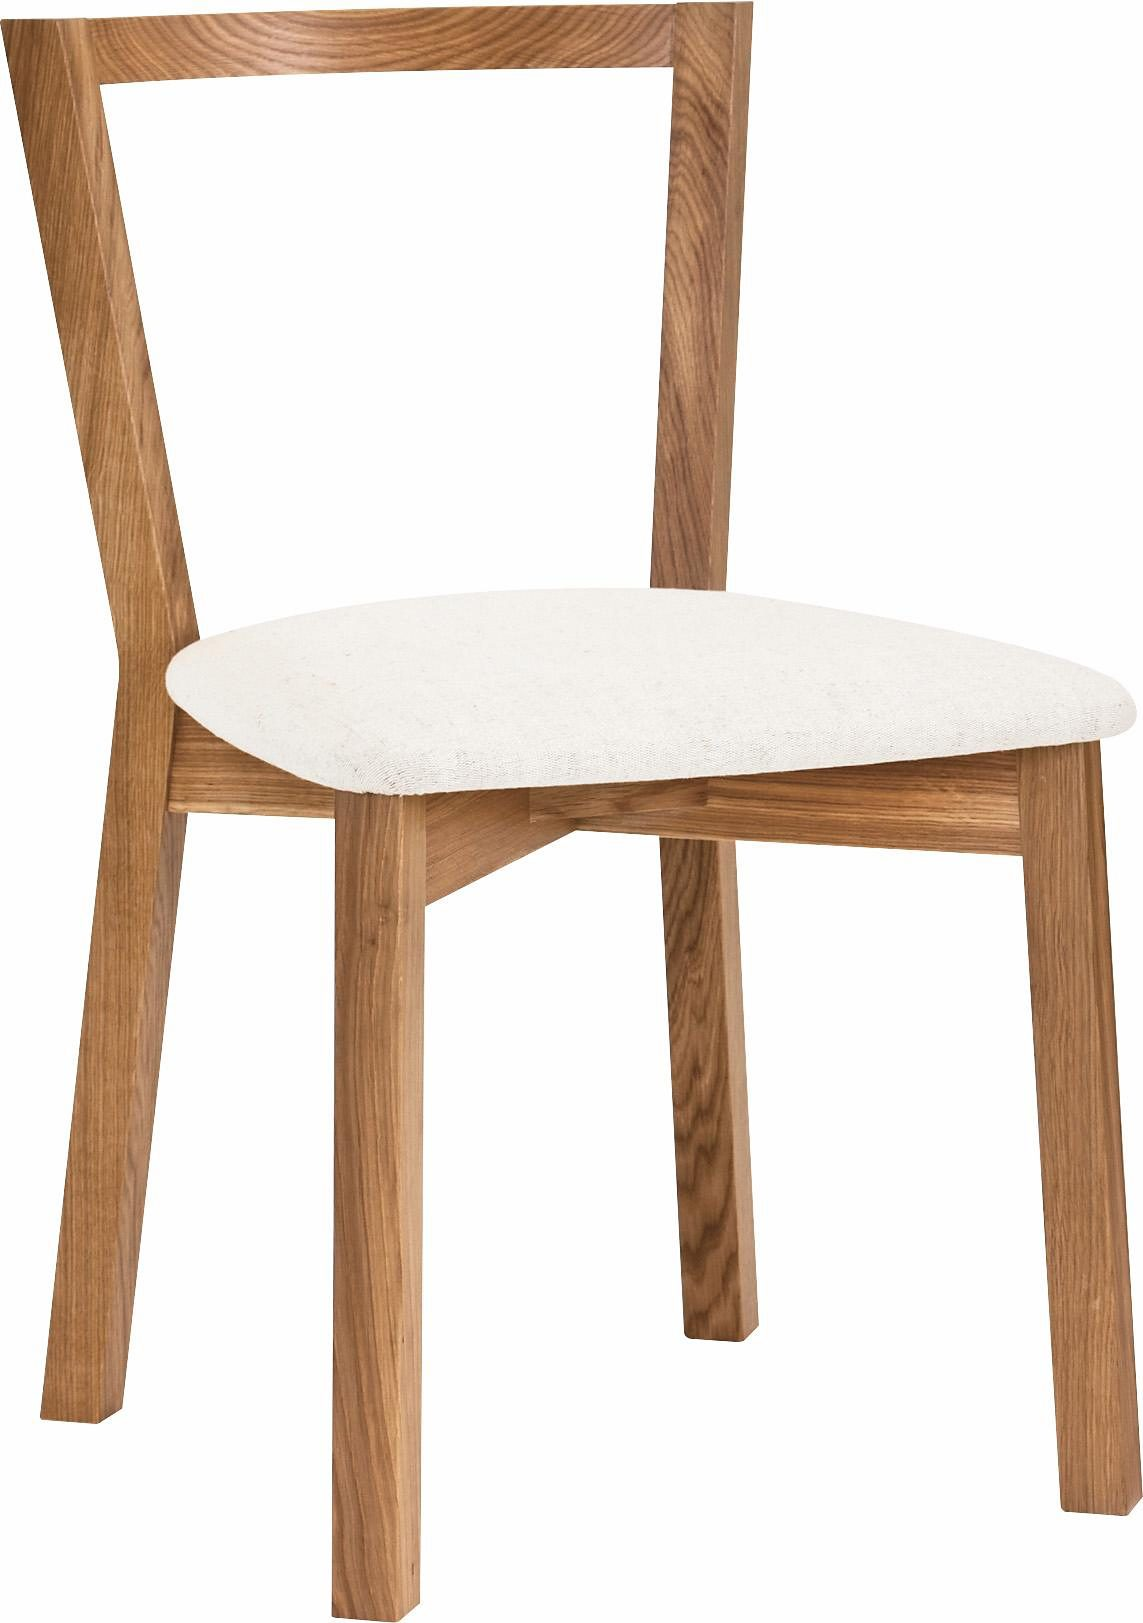 Esszimmerstuhl Holz: Massivholz Stühle online kaufen bei Pharao ...